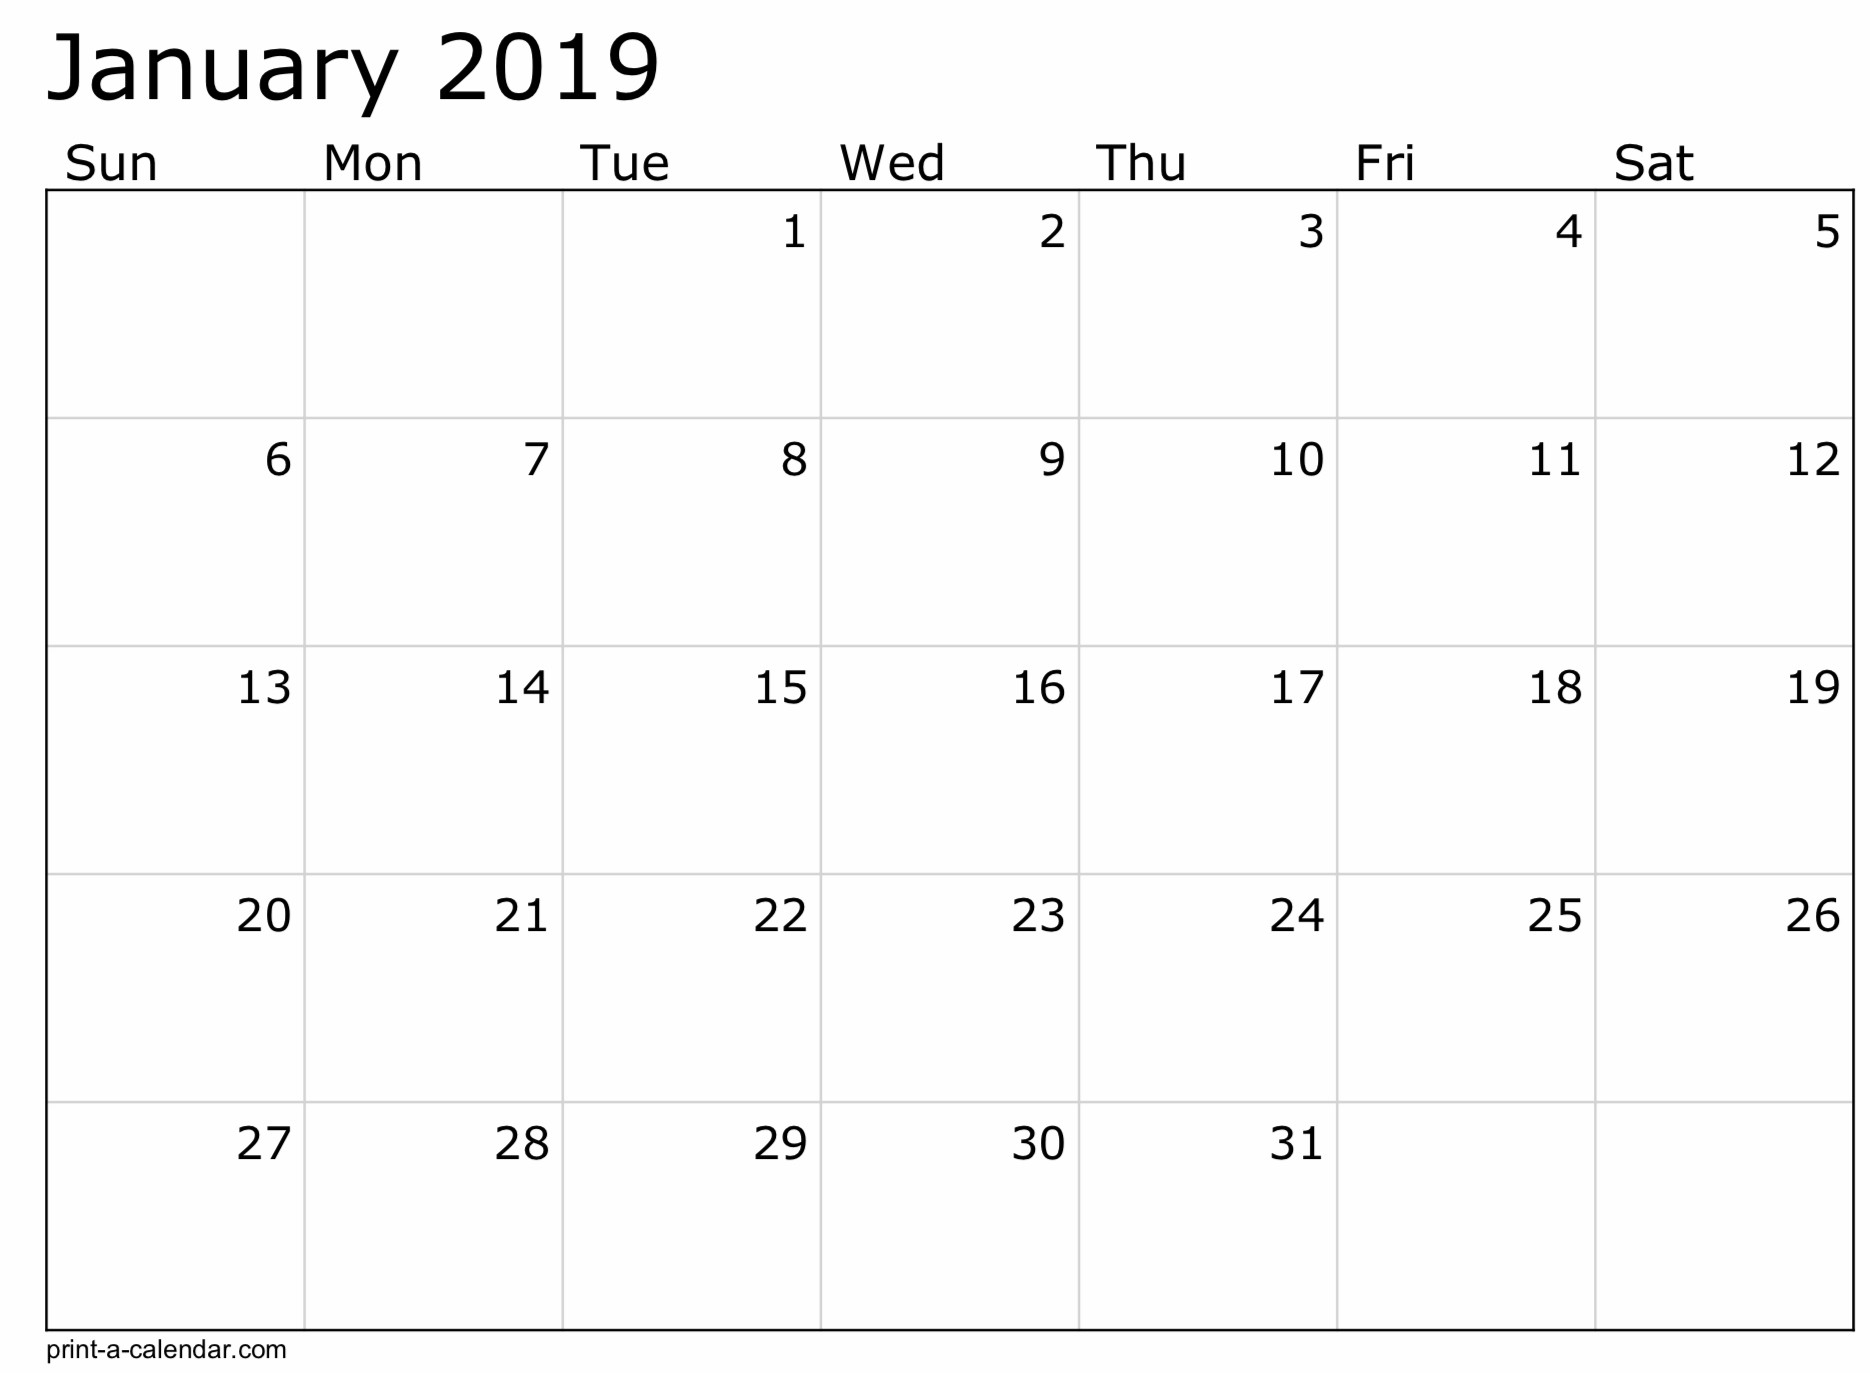 2019 Free Printable Calendar Templates - A Mother's Random-8 X 10 Prinable Blank Monthly Calendar